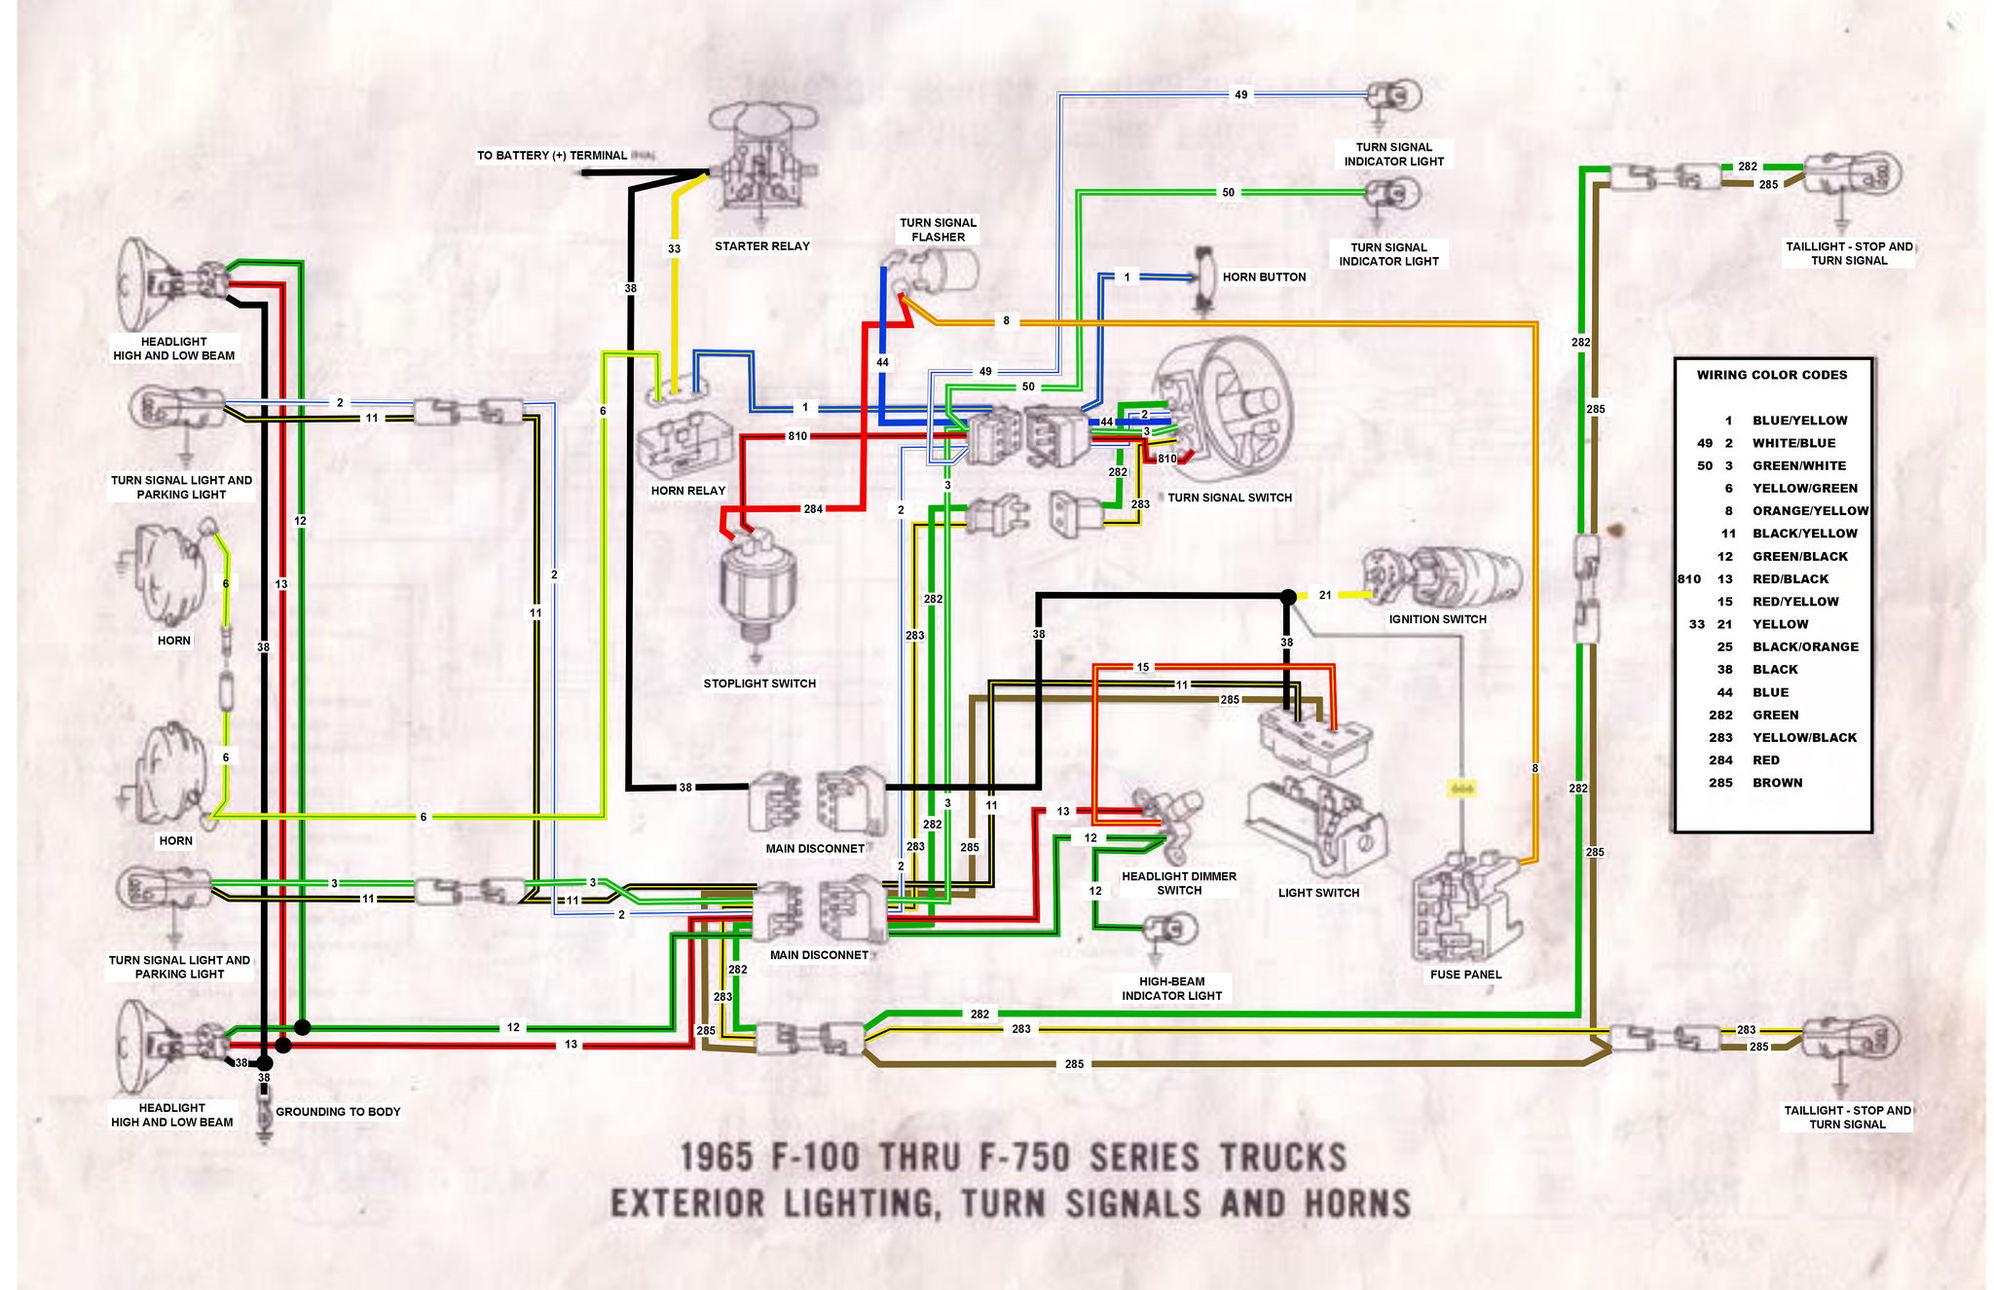 diagram mesin vespa 1367 x 980 jpeg 201kb parts diagram for vespa1367 x 980 jpeg 201kb parts diagram for vespa vnx 7 mci bus wiring schematic index listing of wiring diagramsvan hool wiring diagram kei music city uk